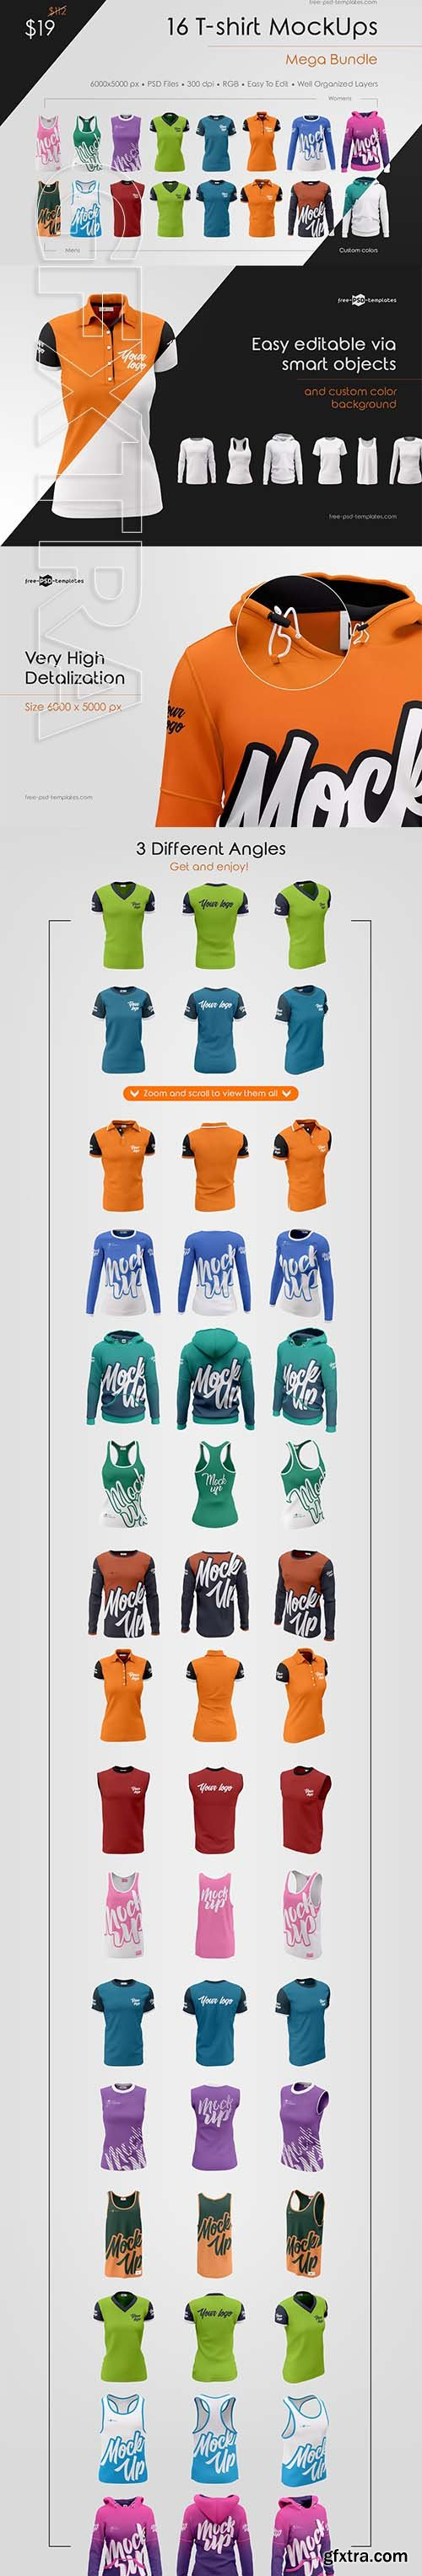 CreativeMarket - 16 T-shirt MockUps Mega Bundle 3774345